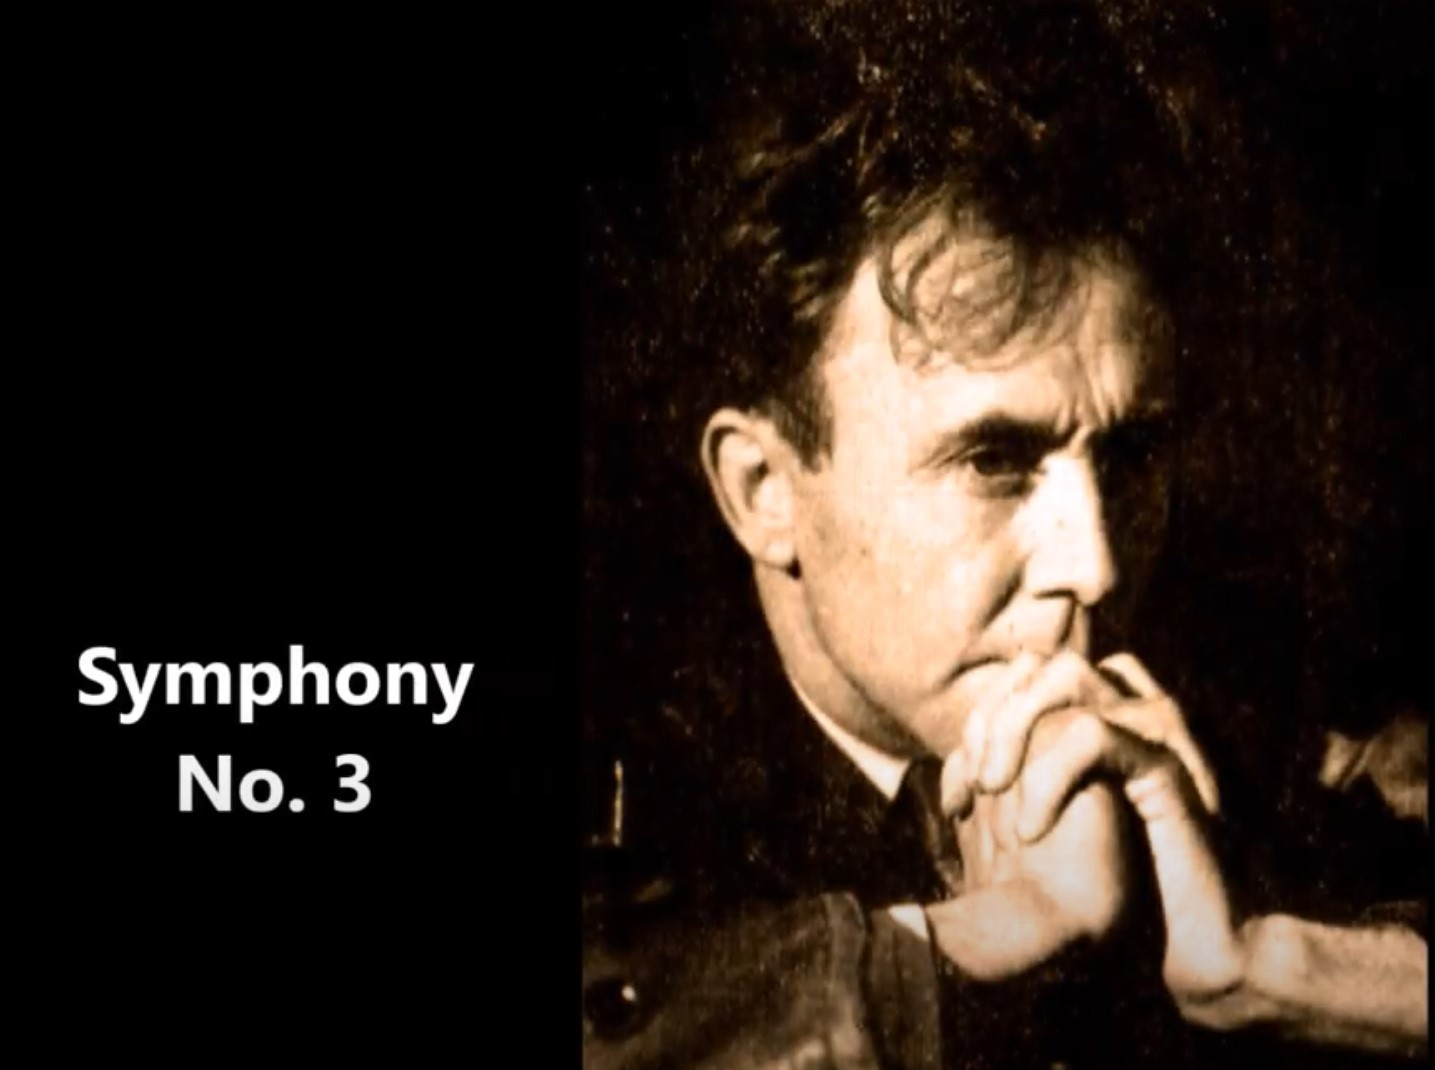 13. Roy Harris (Symphony No. 3)